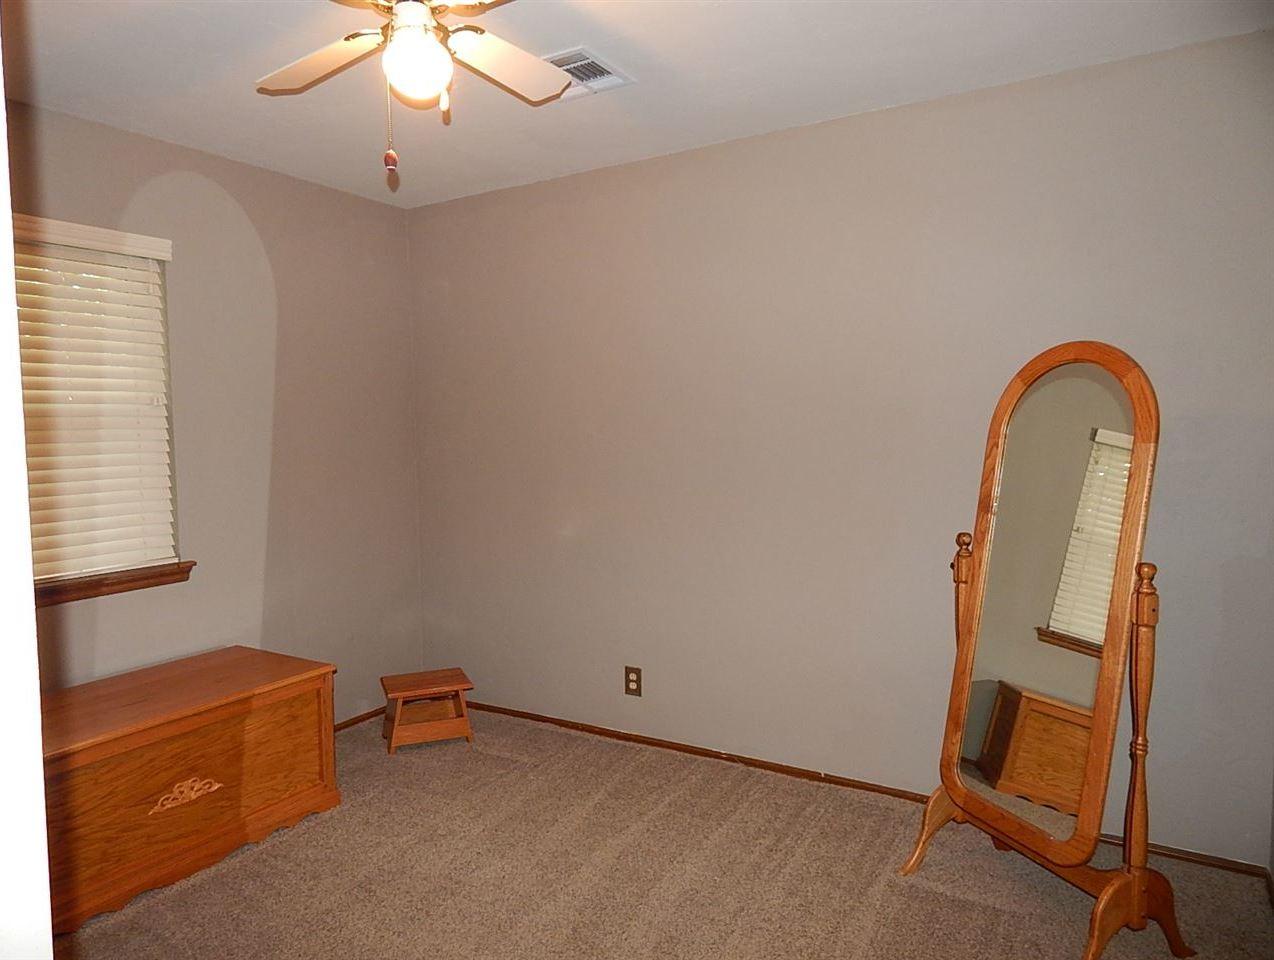 Sold Cross Sale W/ MLS | 2721 Wintergreen Ponca City, OK 74604 23